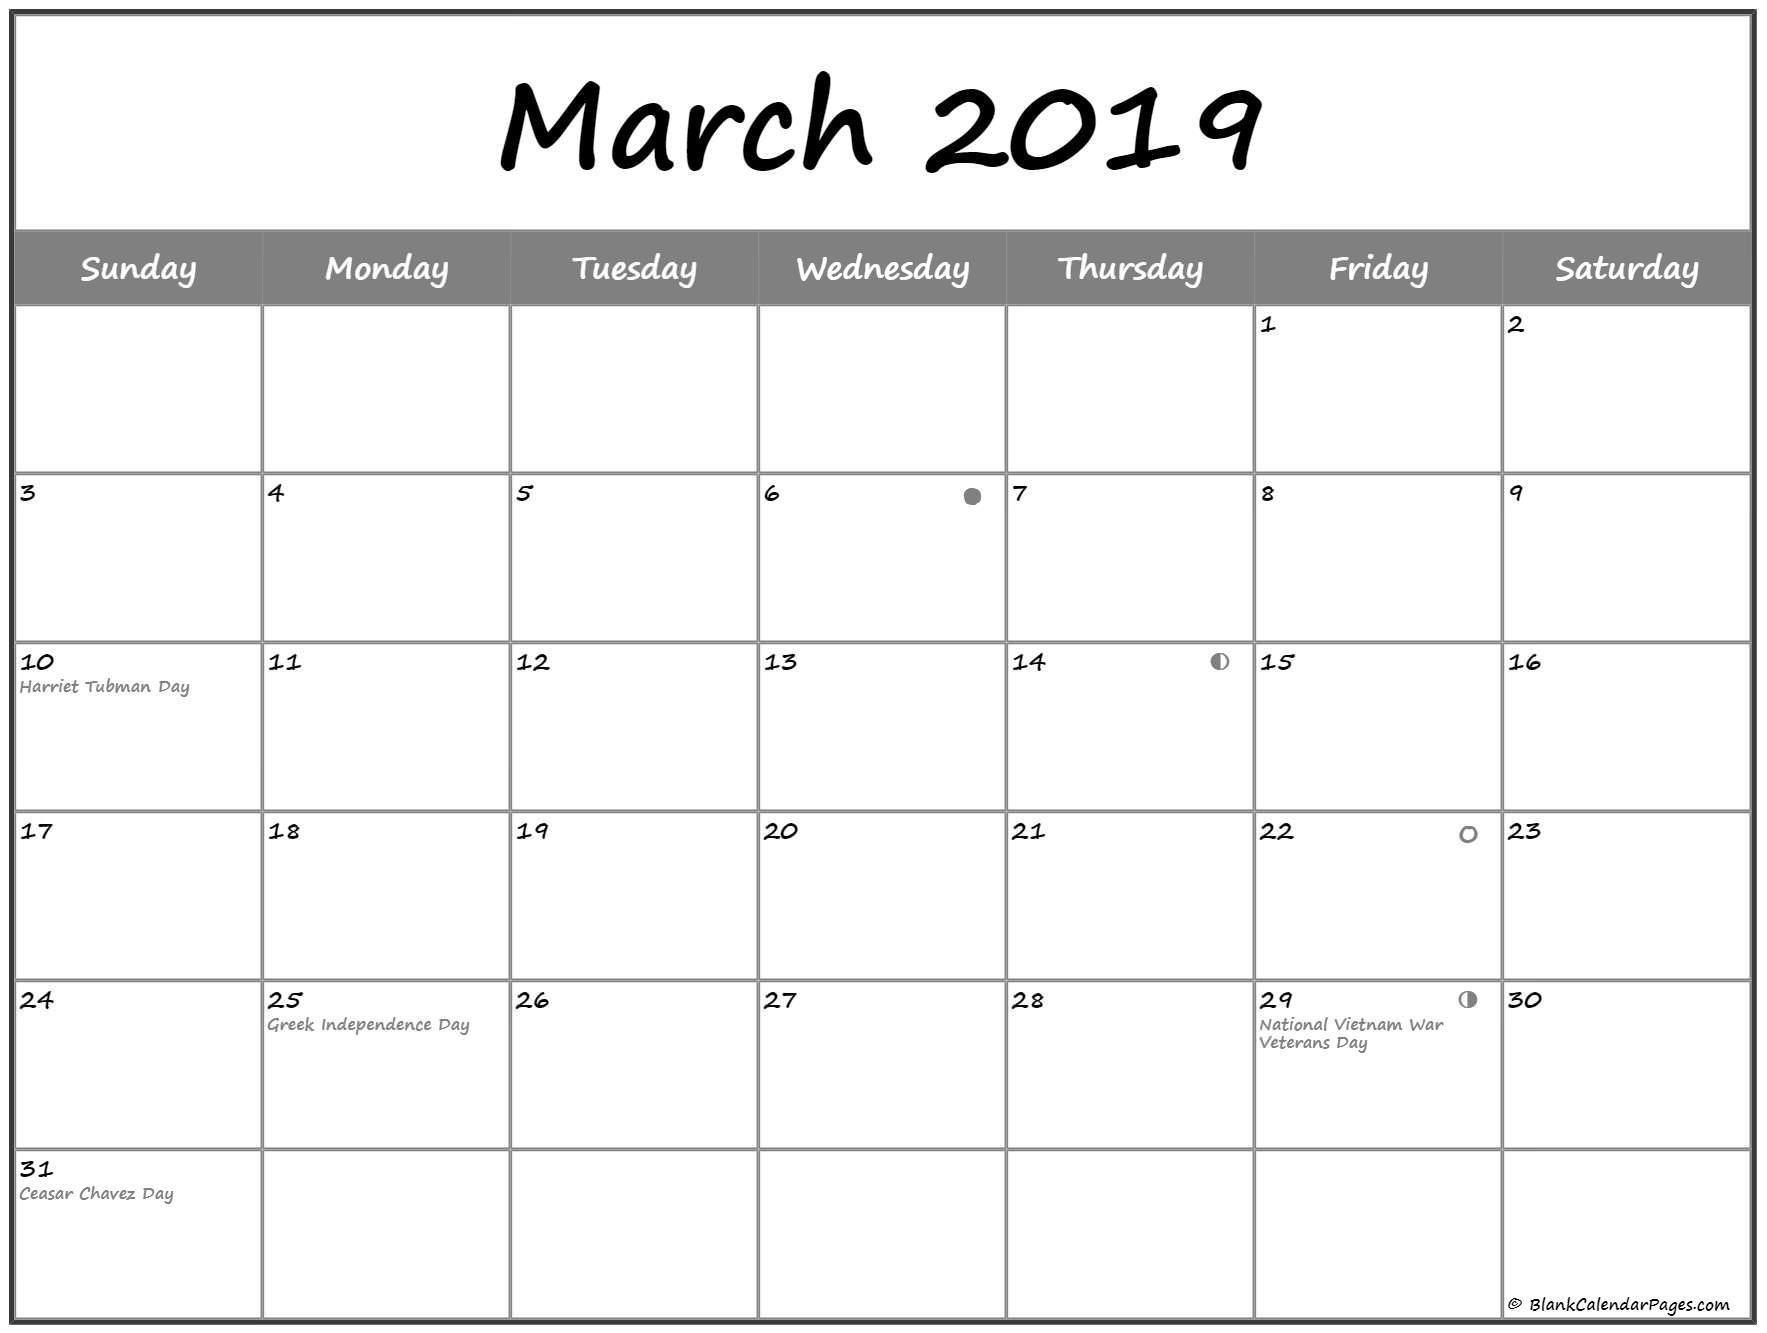 March 2019 Lunar Calendar Moon Phases | Free Monthly Calendar pertaining to Template For Lunar Calendar